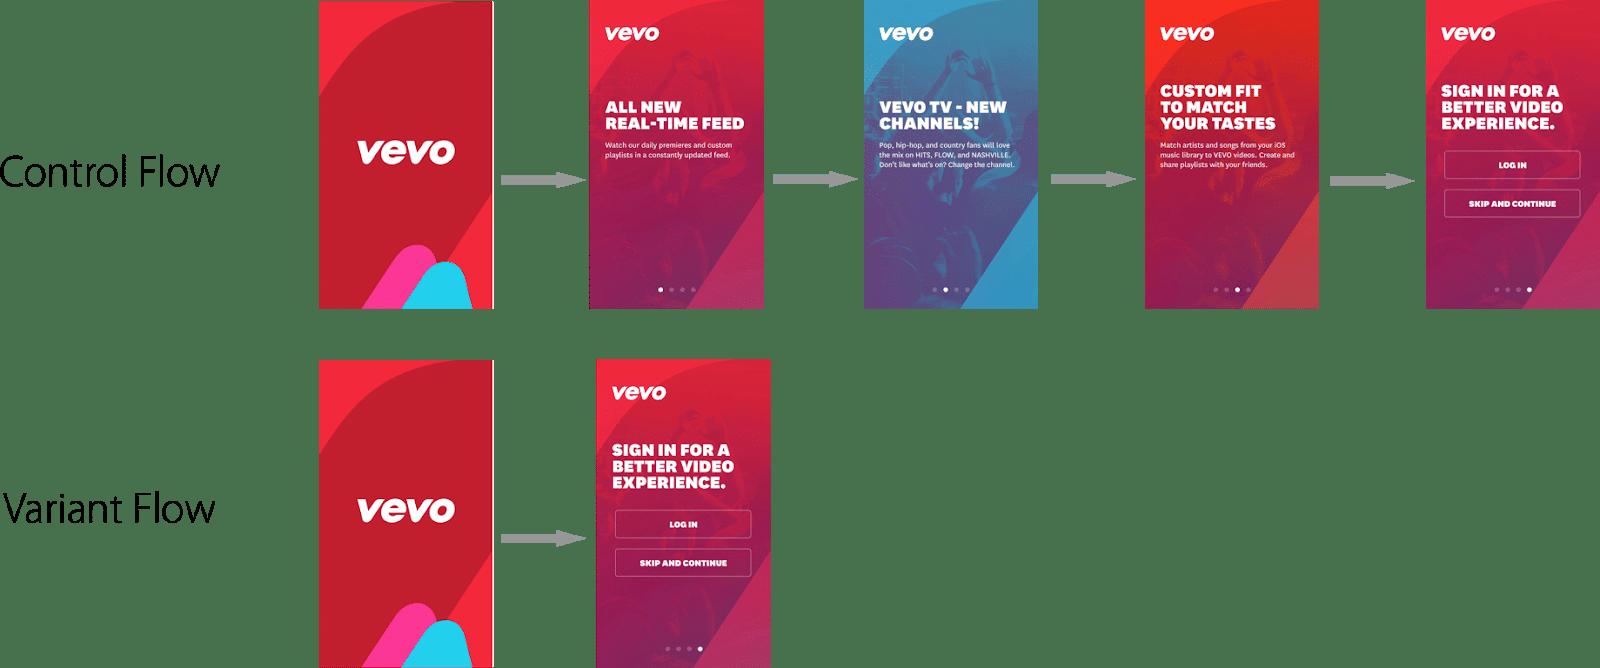 VEVO-control-variant-flow